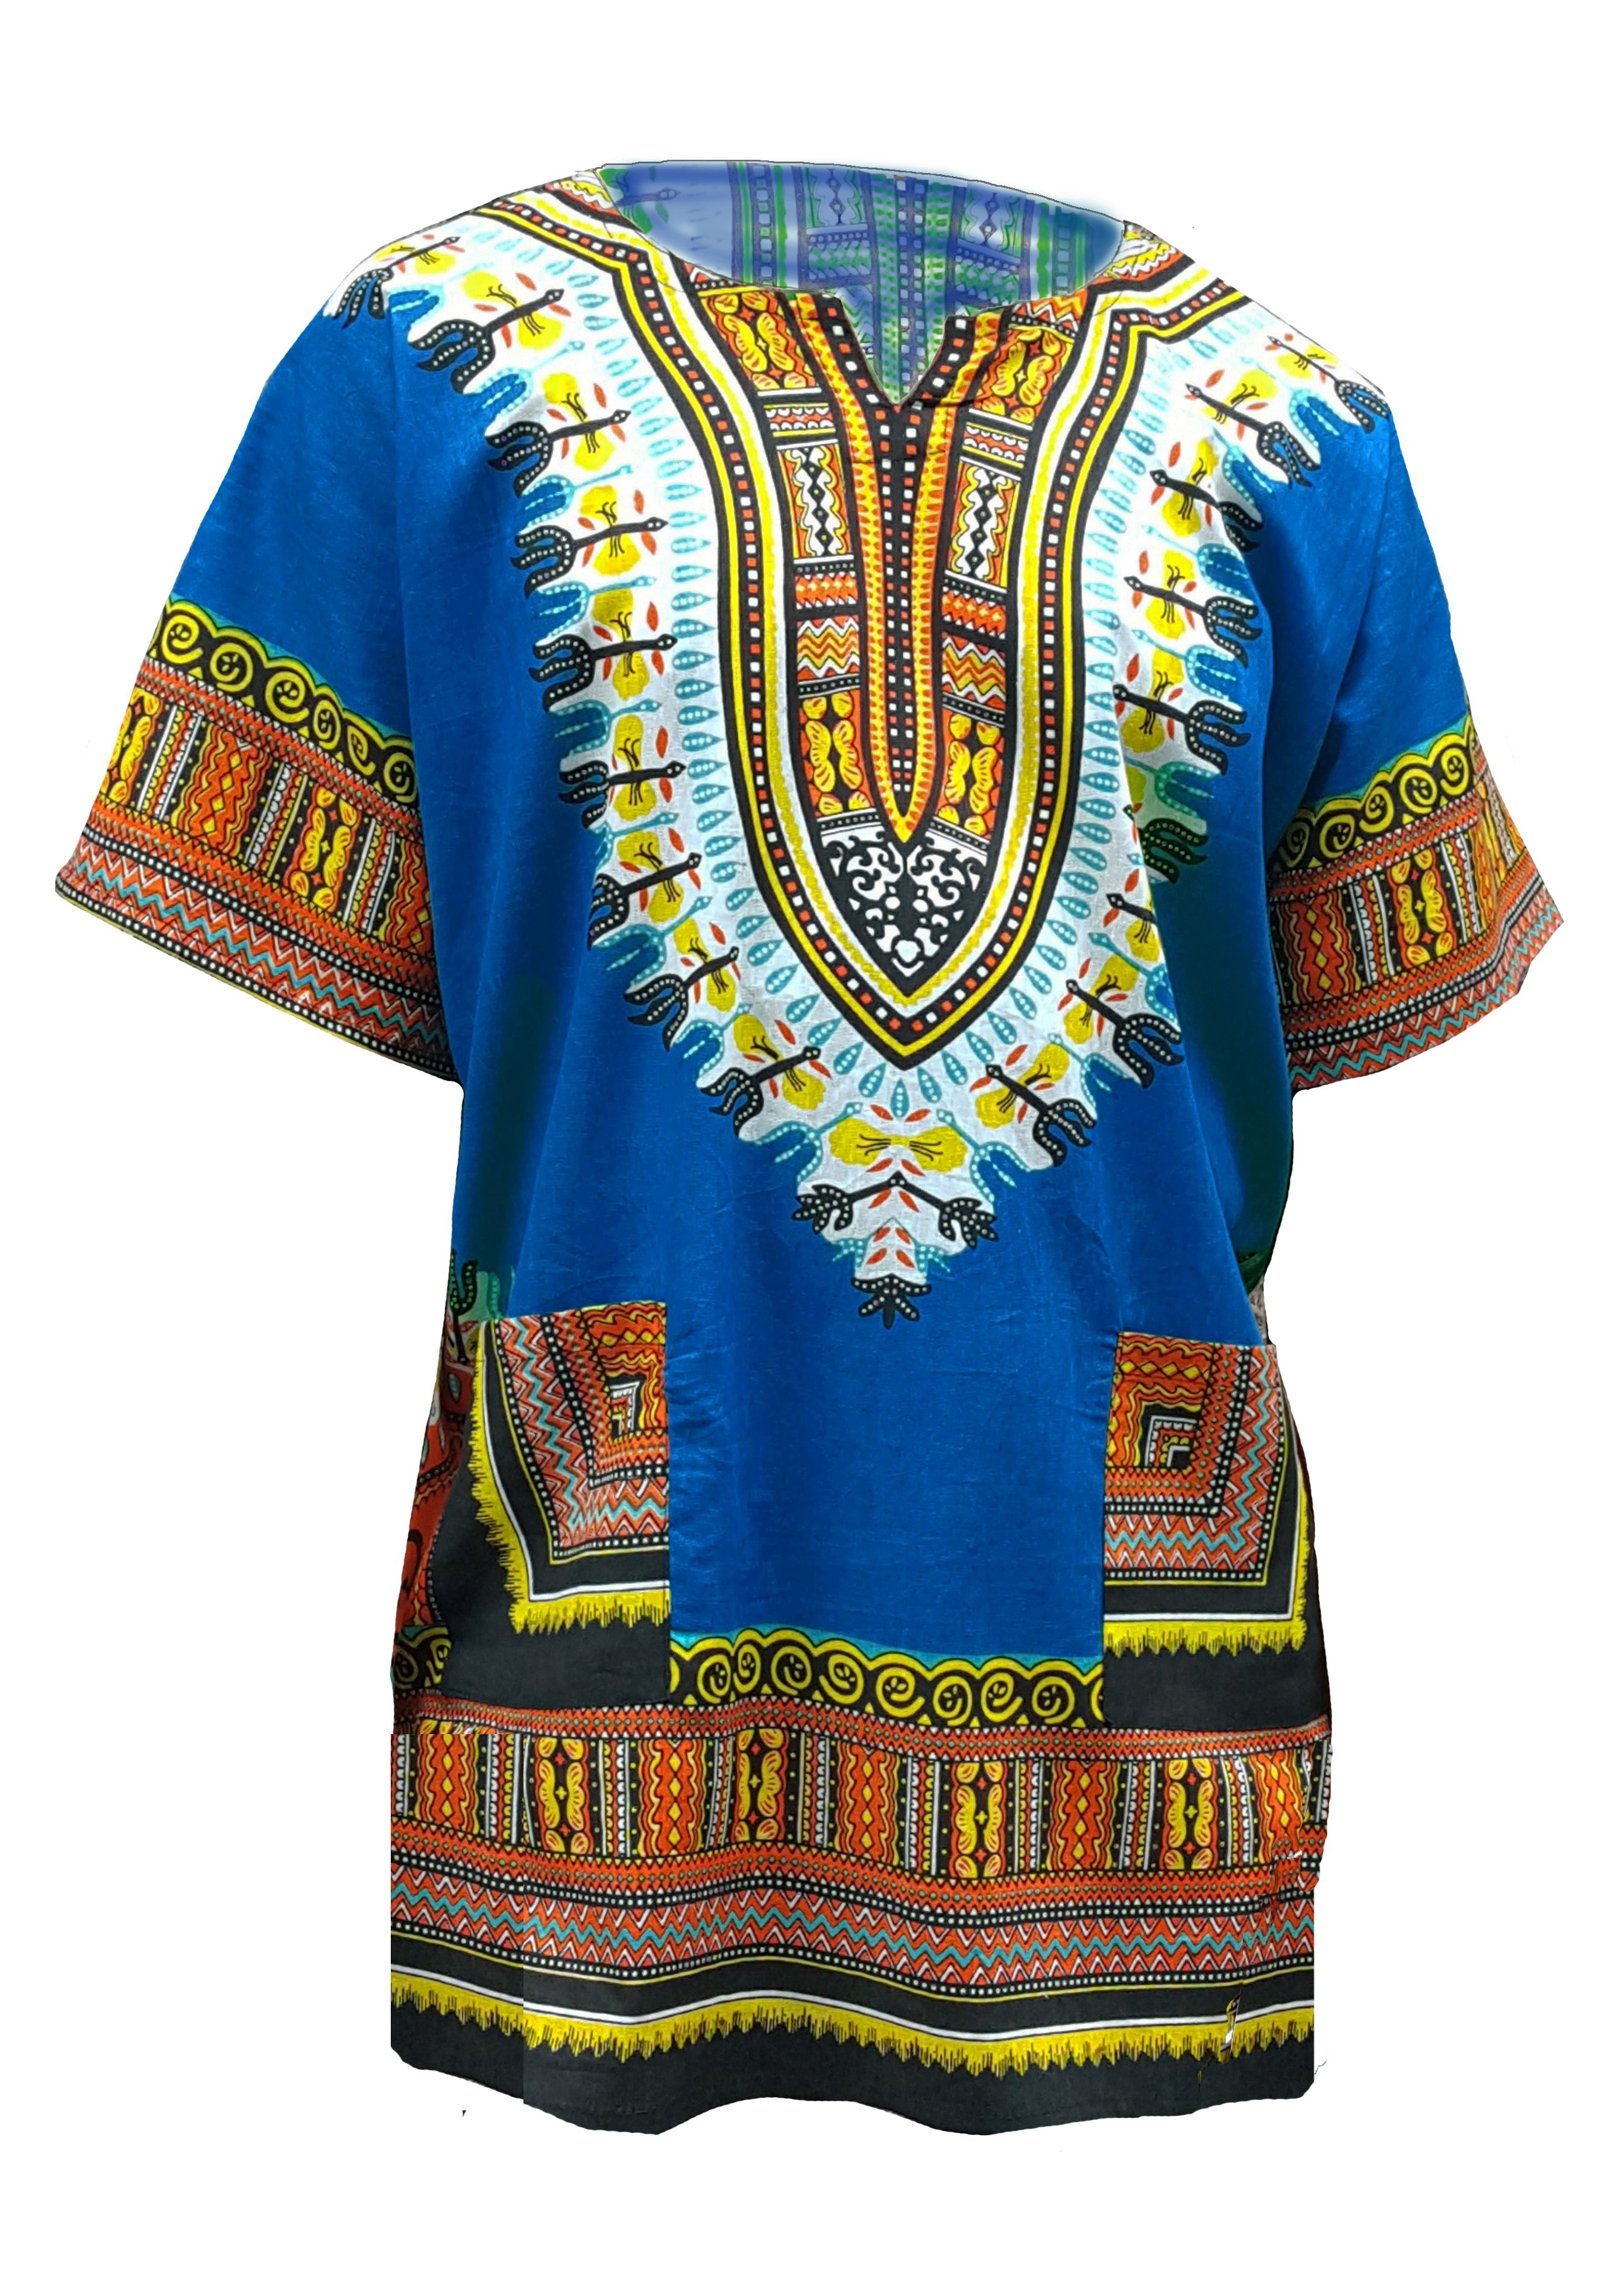 00e6d3ede3e Dupsies - Blue African Print Dashiki Shirt from S to 7XL Plus Size -  Walmart.com